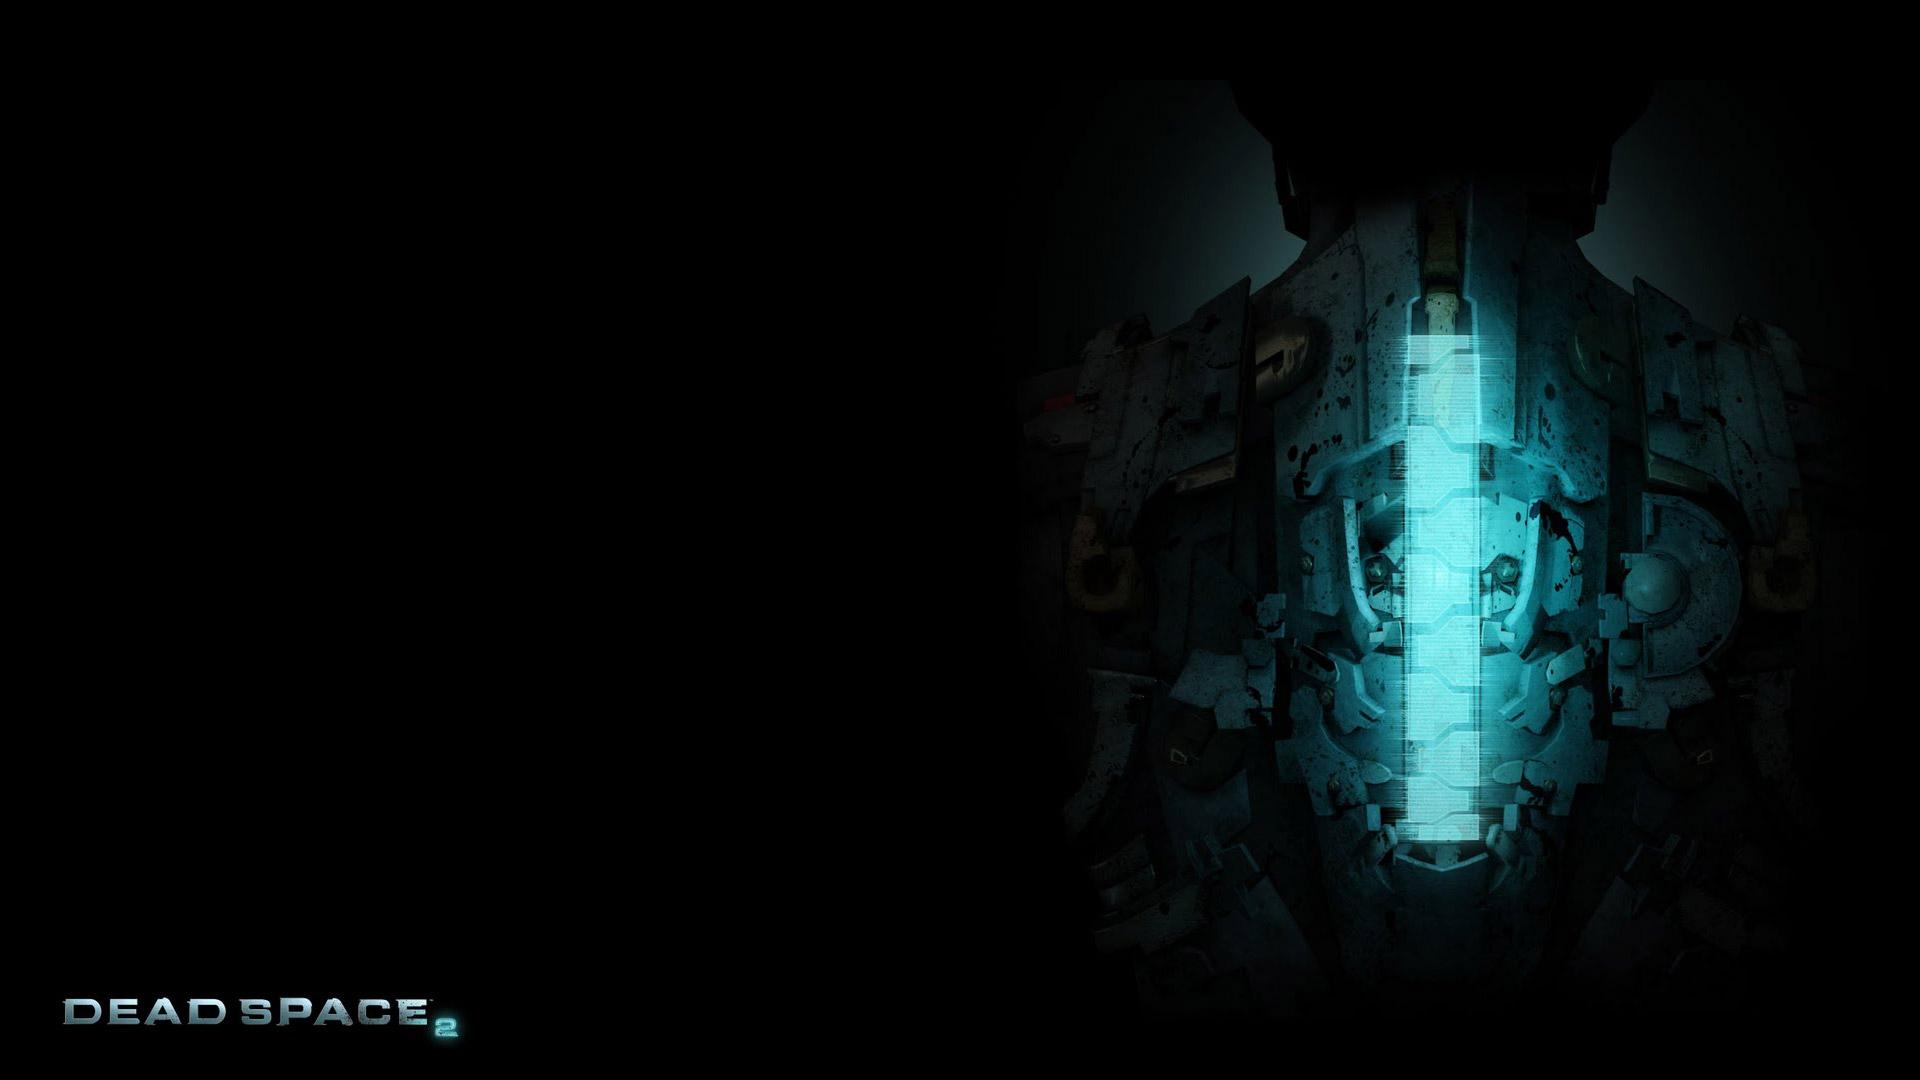 Dead Space 2 1080p Wallpaper Dead Space 2 720p Wallpaper